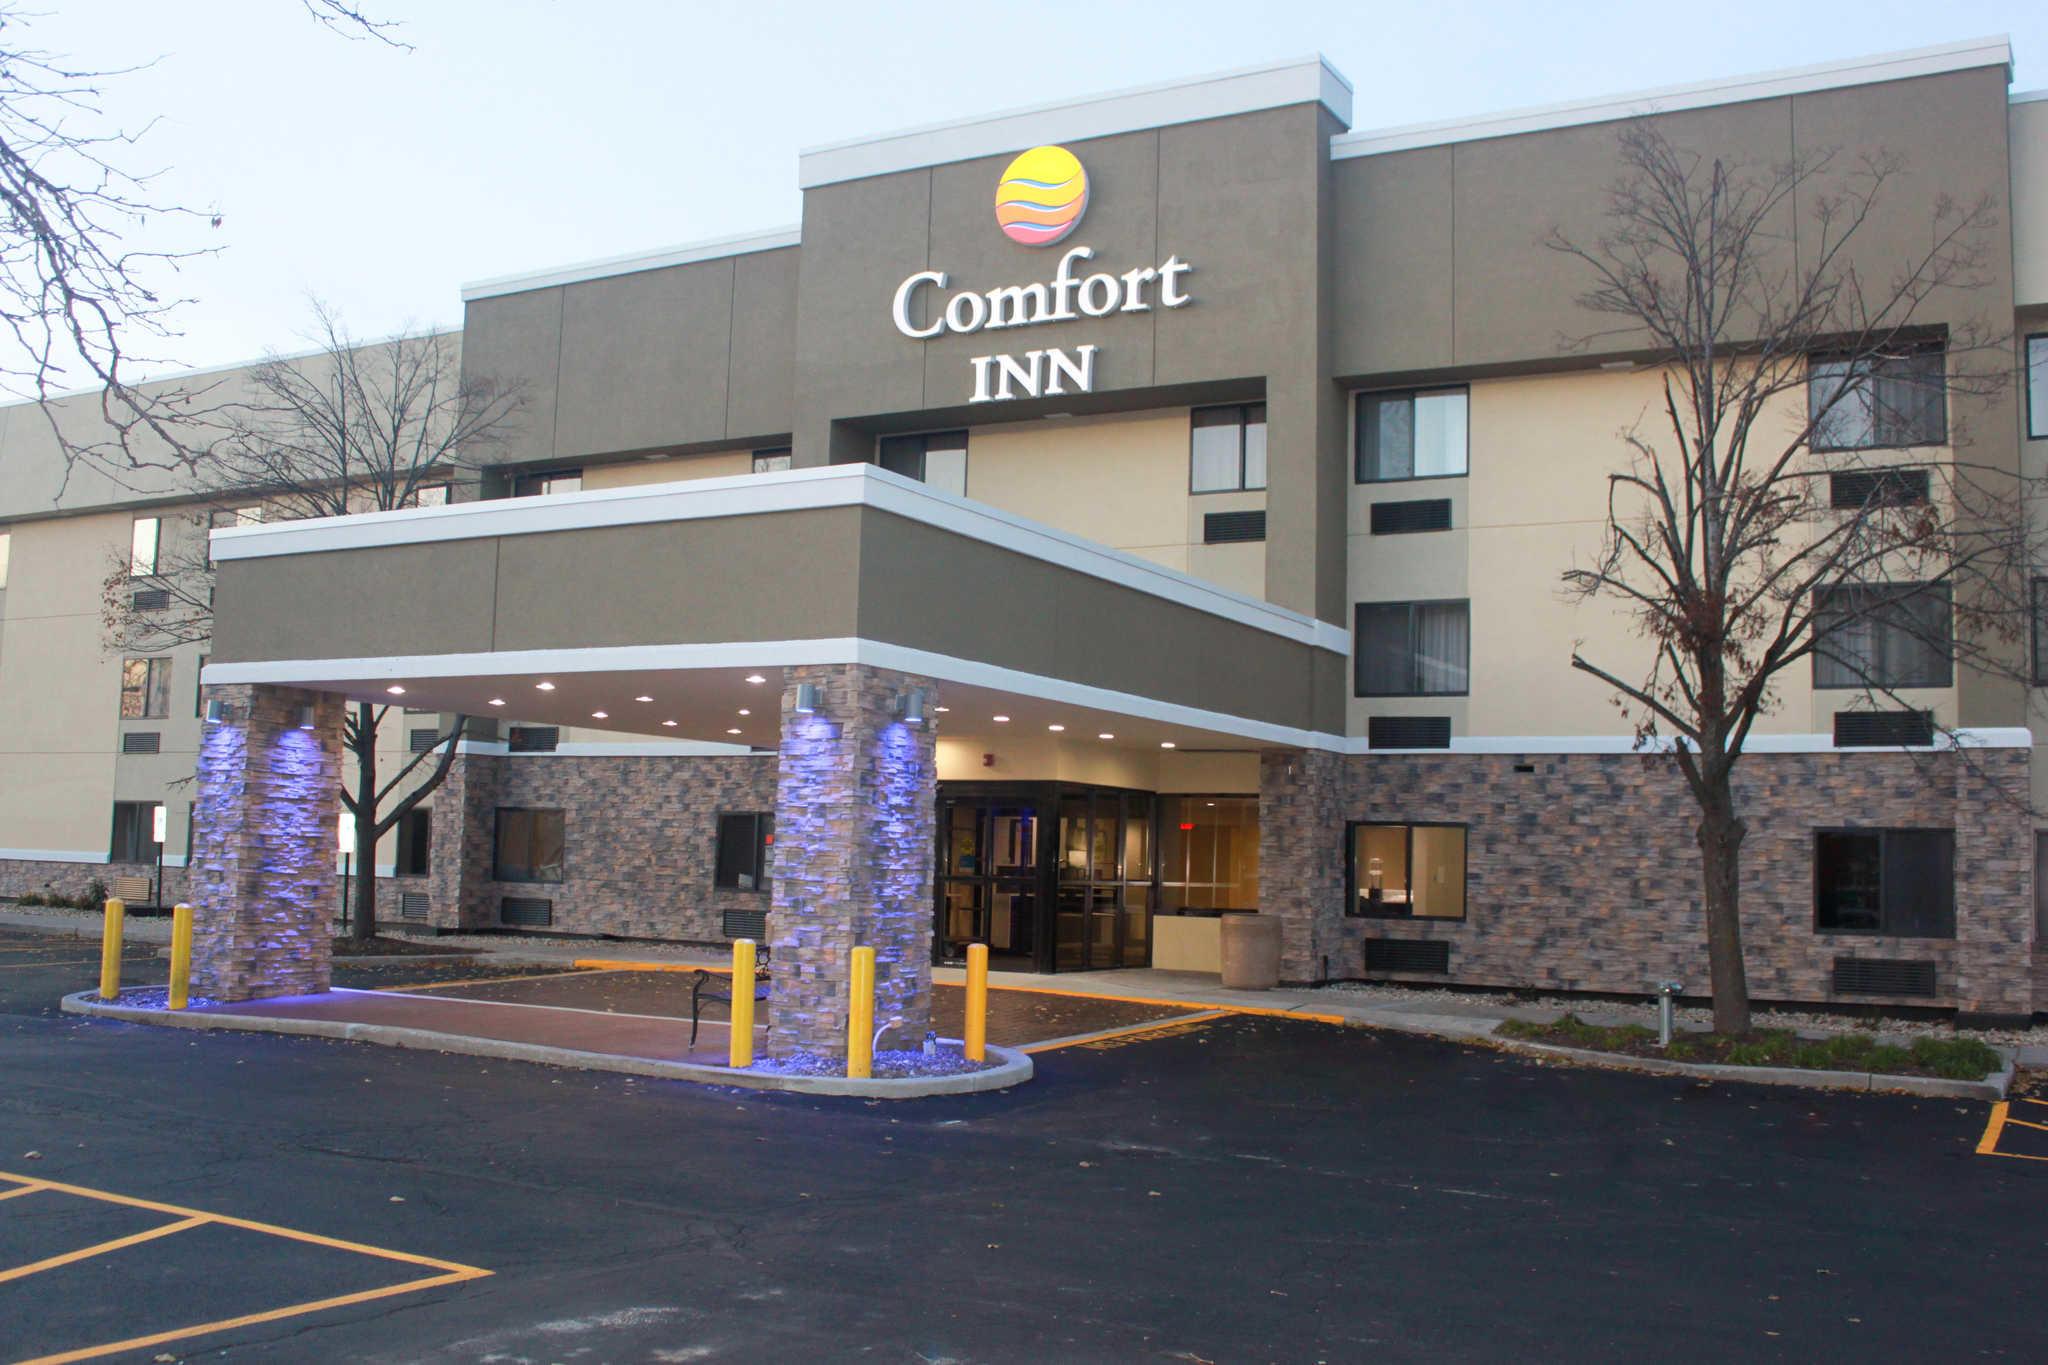 Comfort Inn Matteson - Chicago image 0